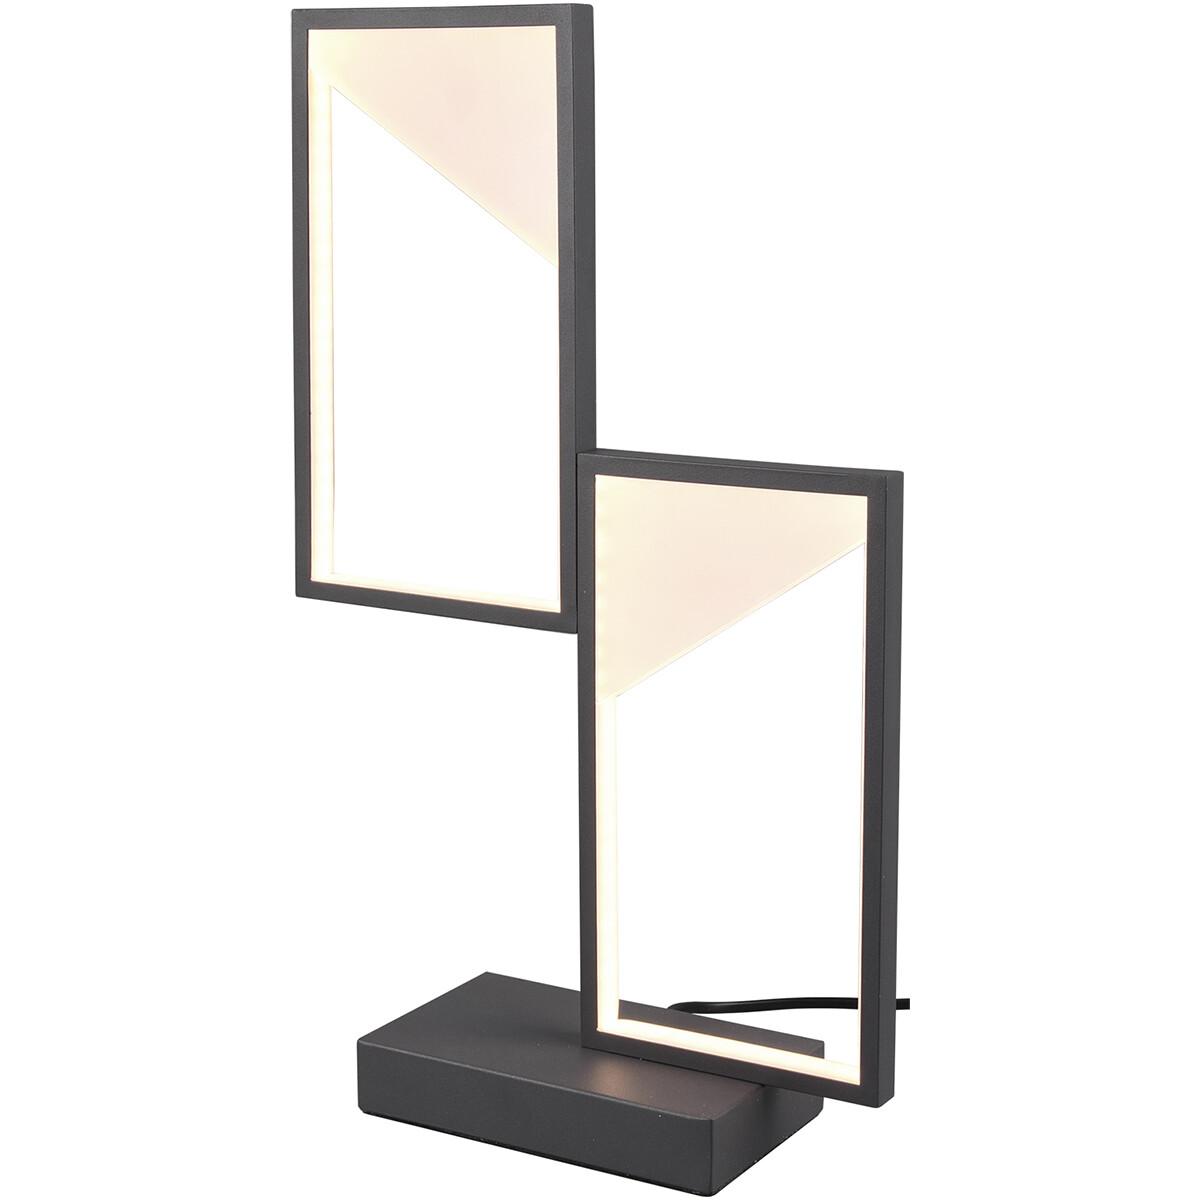 LED Tafellamp - Tafelverlichting - Trion Civa - 14W - Warm Wit 3000K - Dimbaar - Rechthoek - Mat Zwart - Aluminium